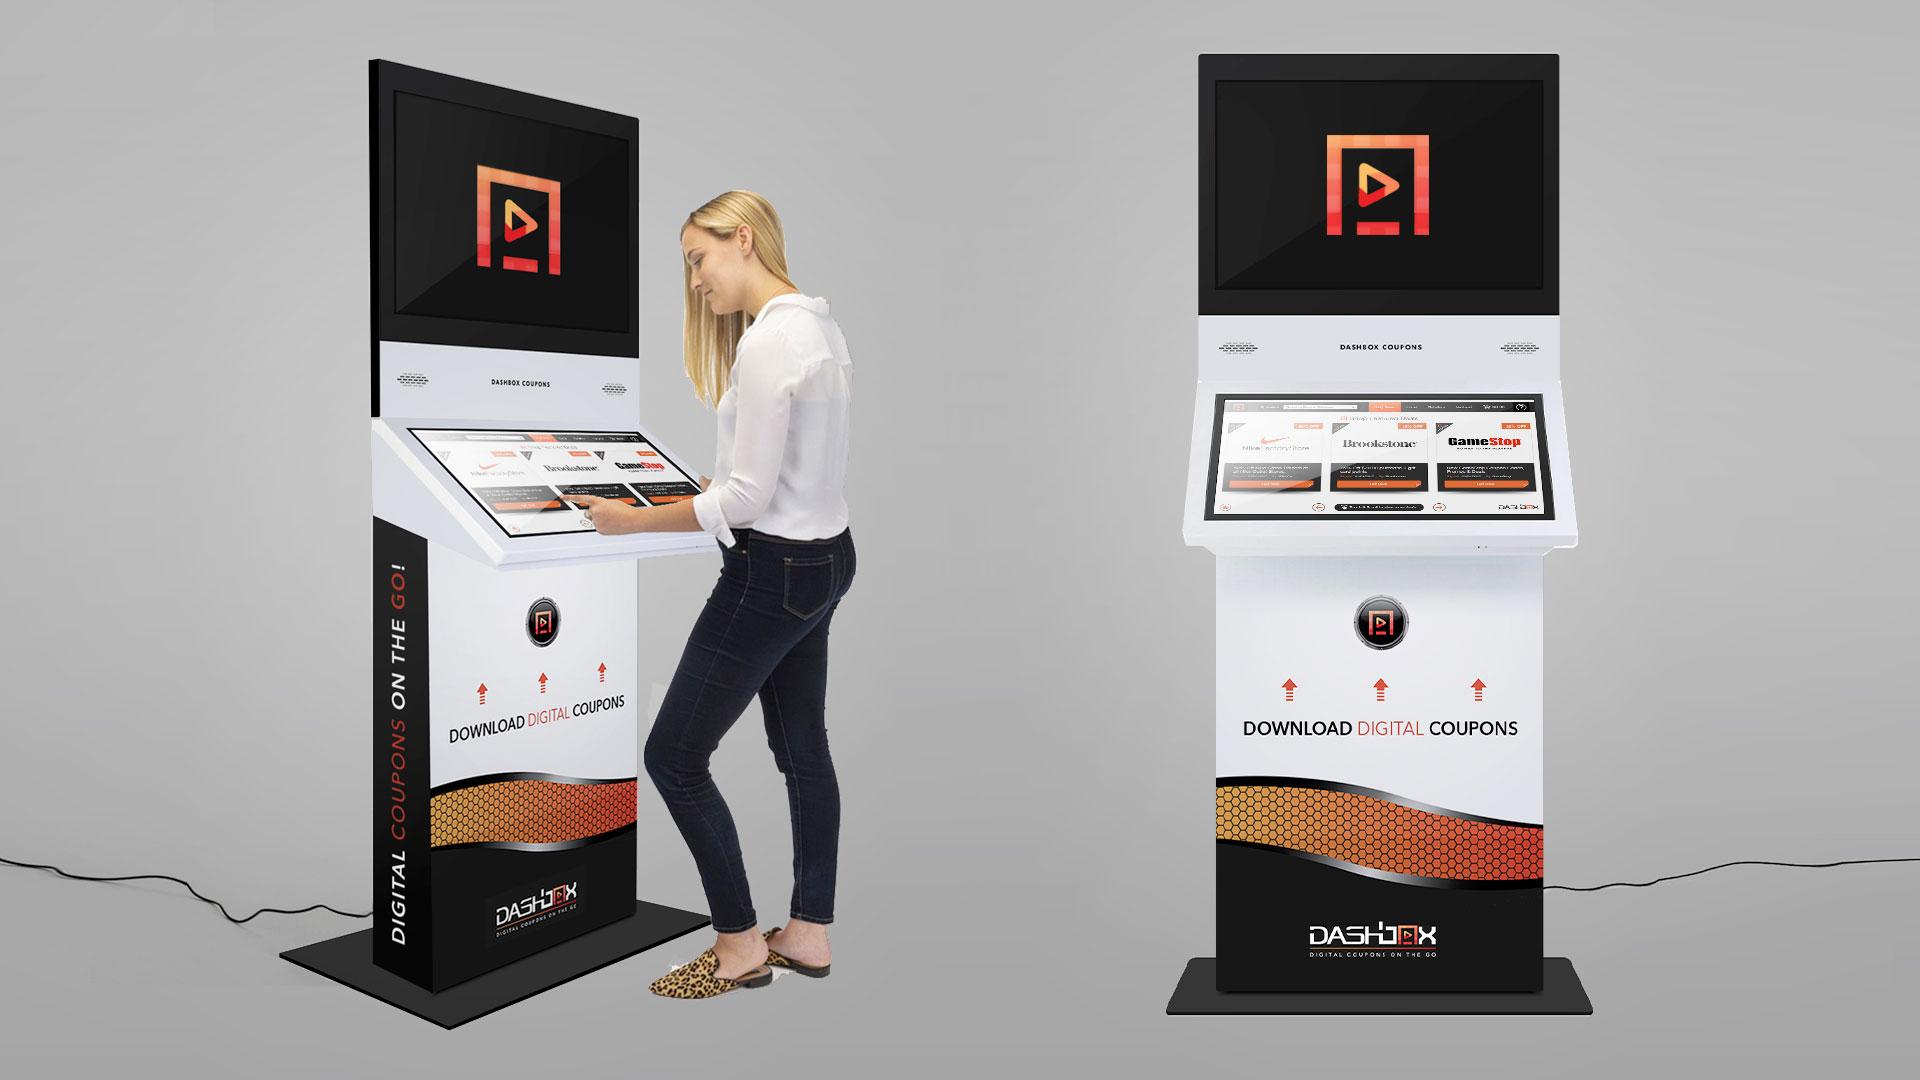 RITS Creative team designs new Digital kiosk Mockups for our client DASH MEDIA